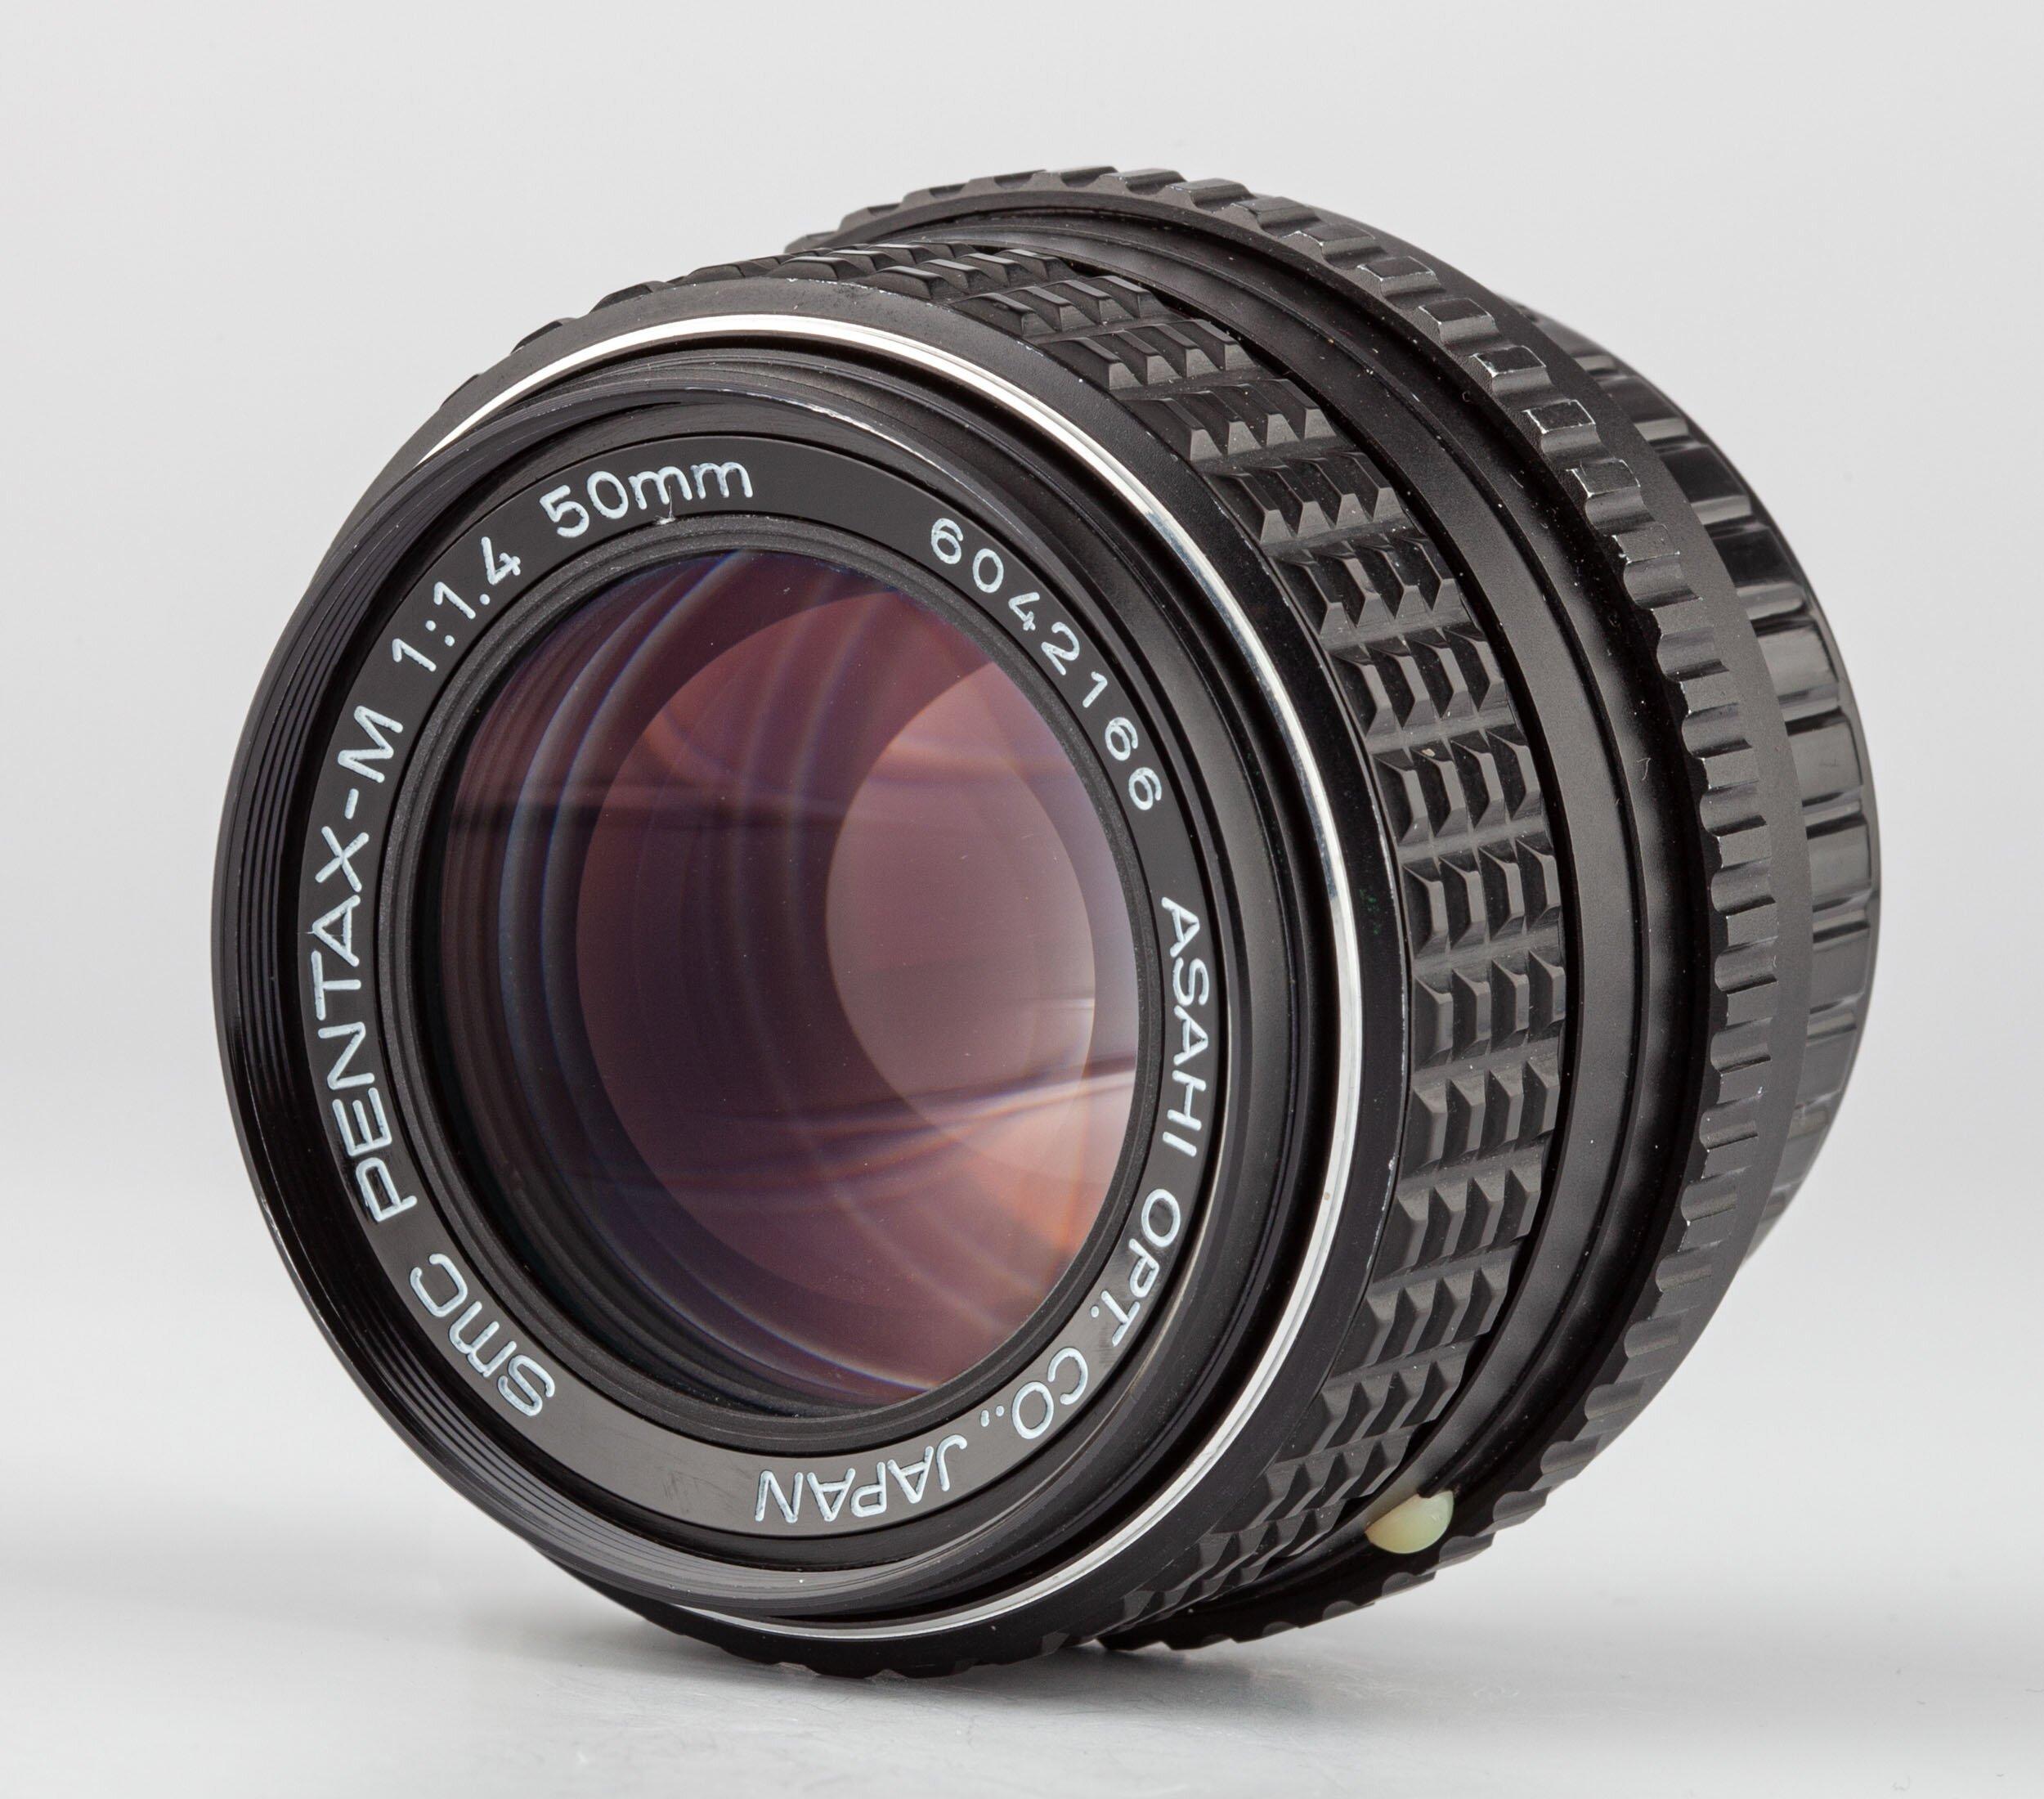 SMC Pentax-M 1,4/50mm PK